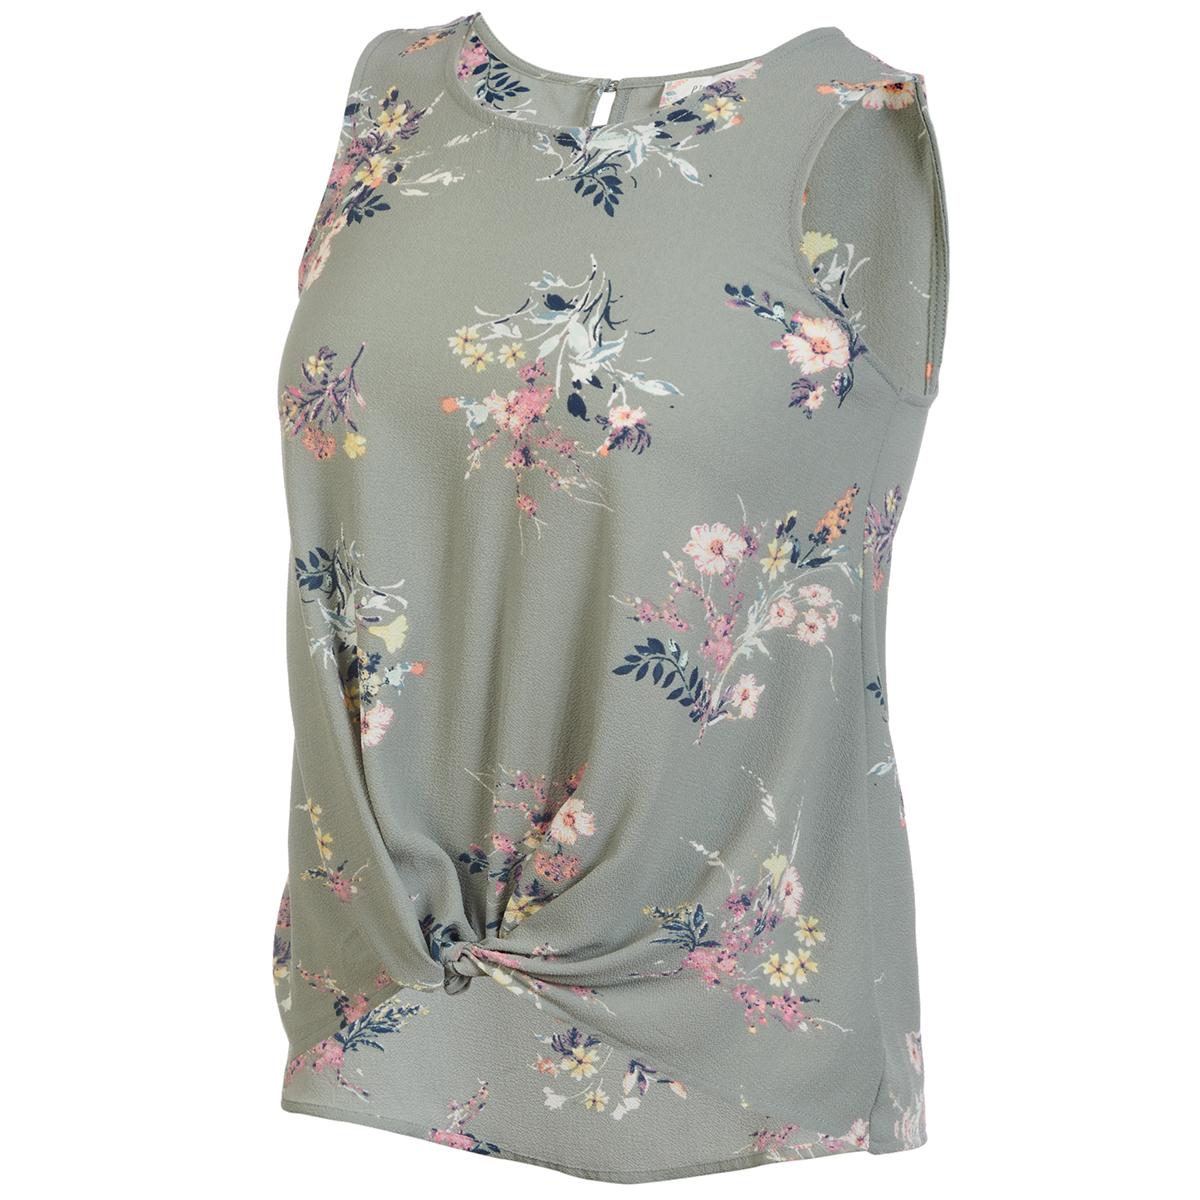 Pink Rose Juniors' Button Front Sleeveless Top - Green, S